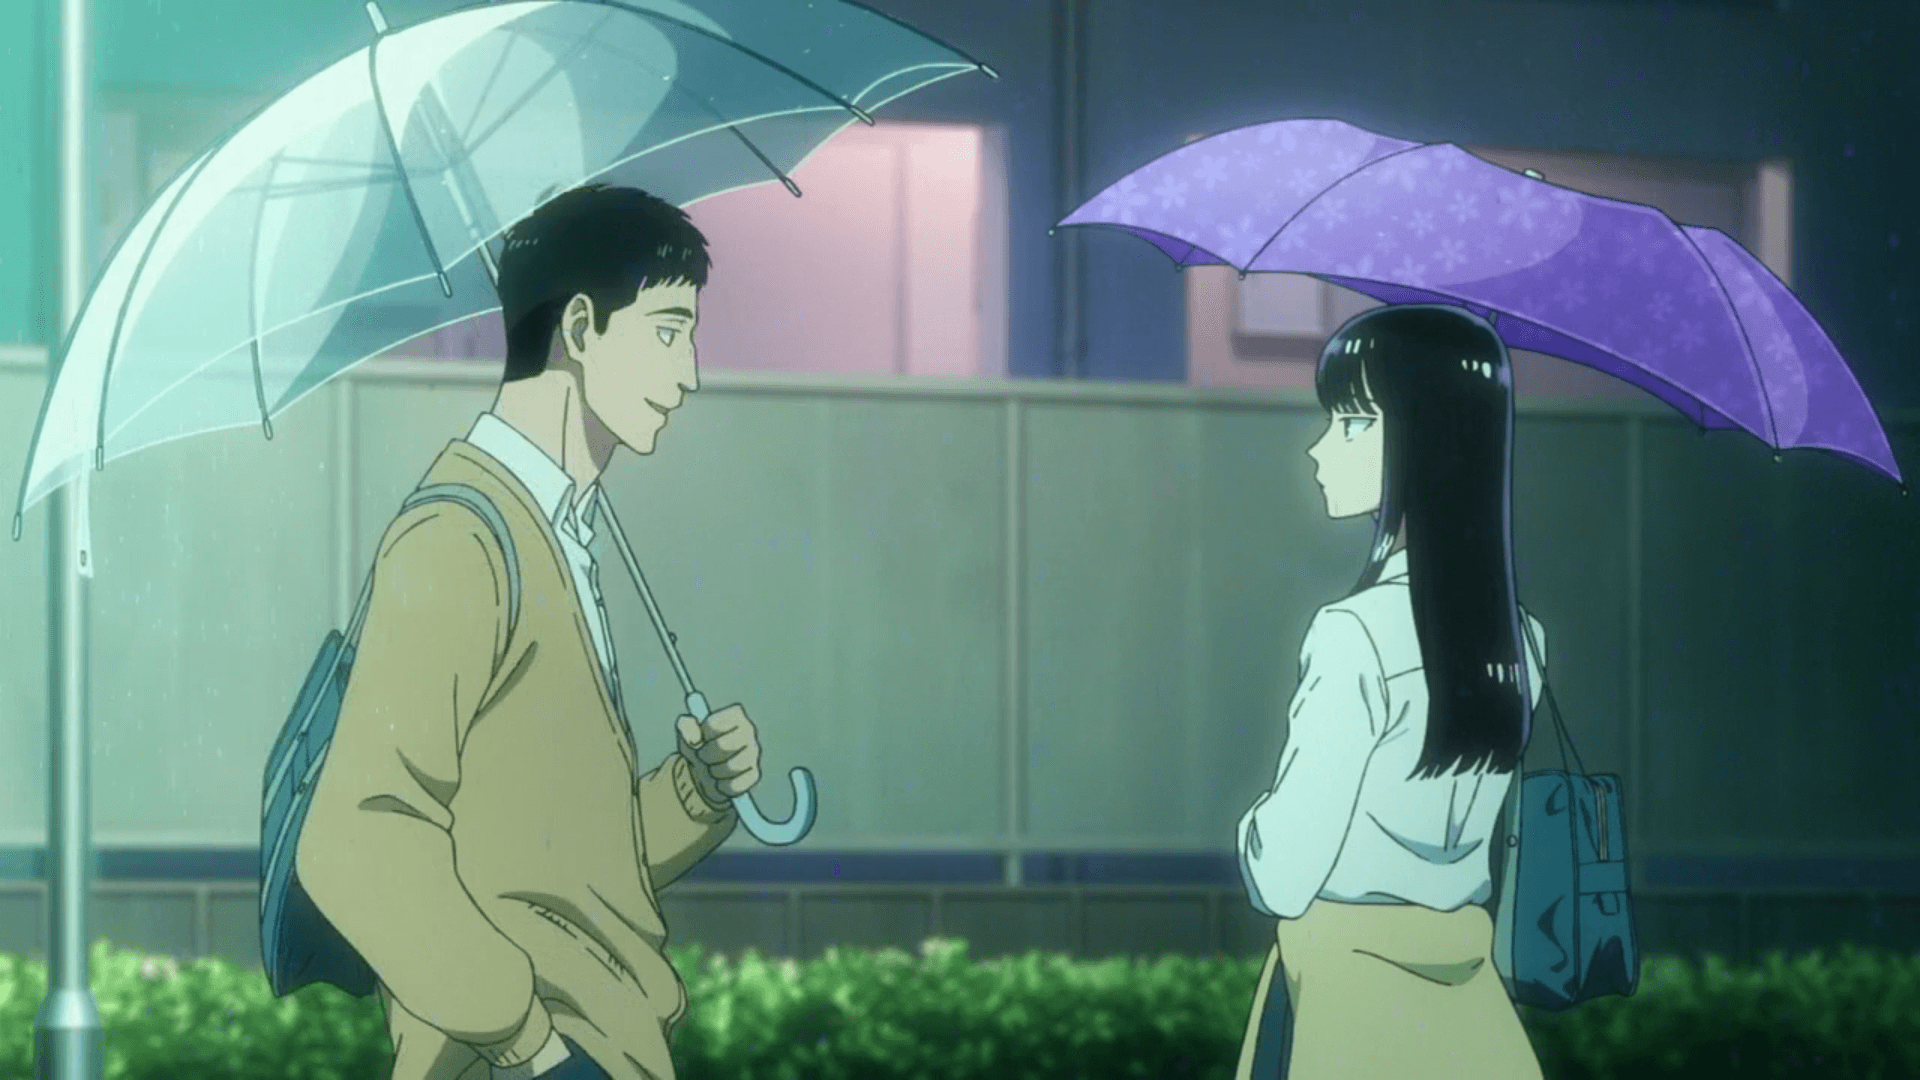 romantic anime like Higehiro, After the Rain